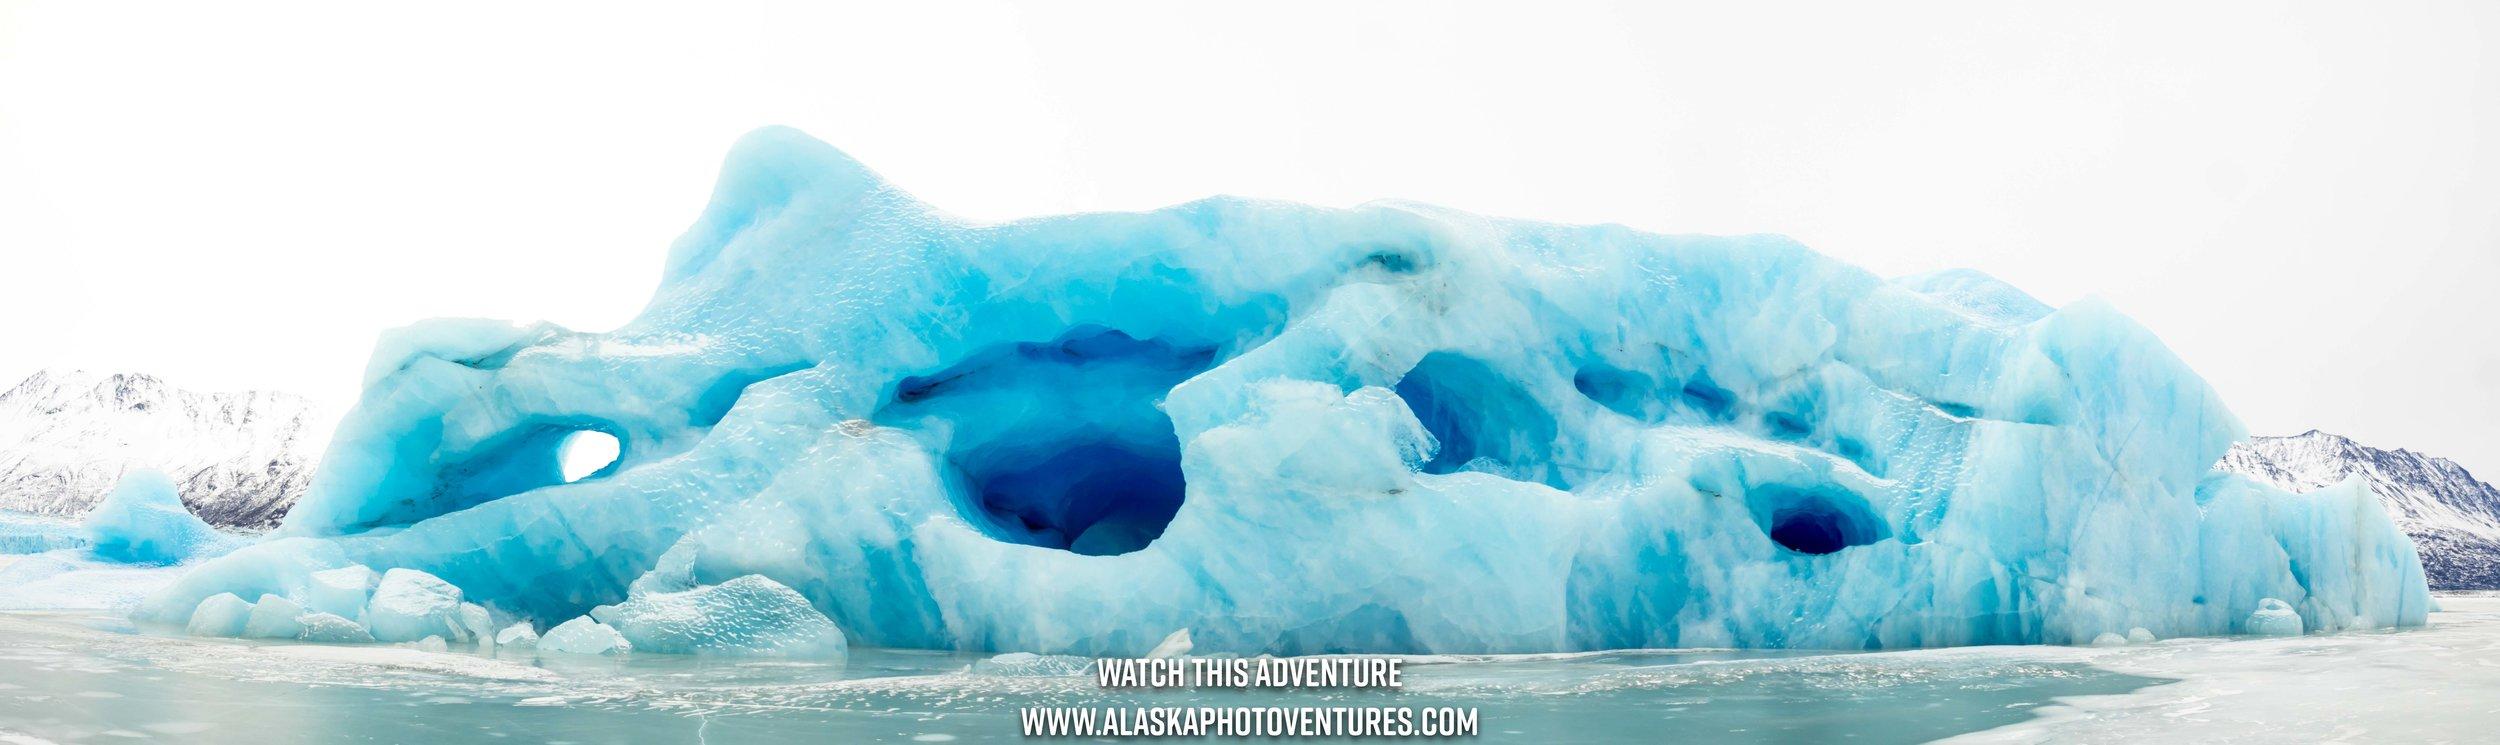 colony-glacier-adventure-photography-tv-show-alaska.jpg10.jpg